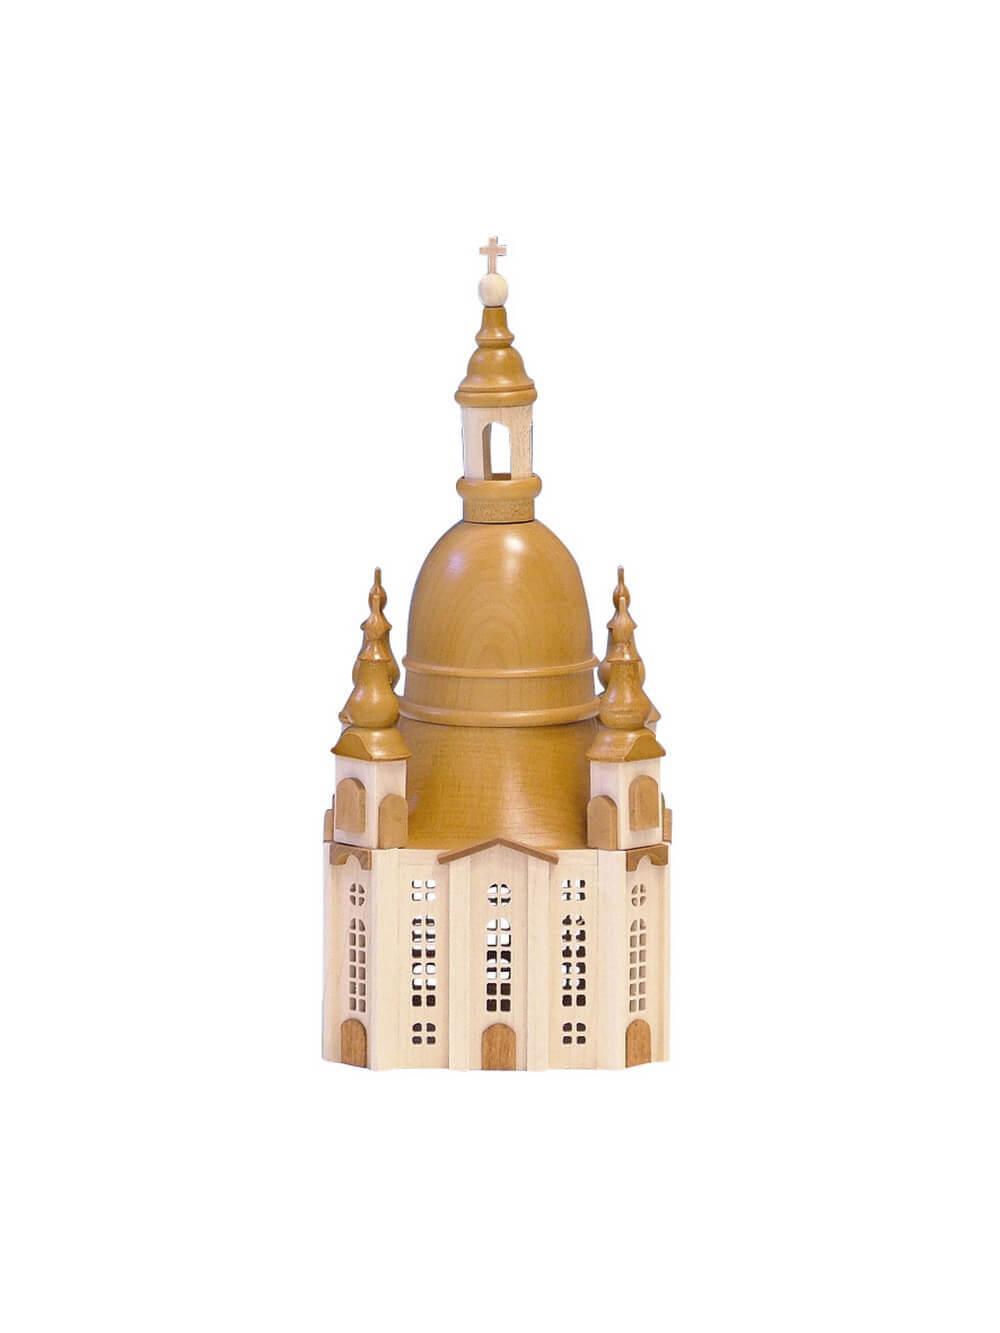 Knuth Neuber, Frauenkirche aus Holz